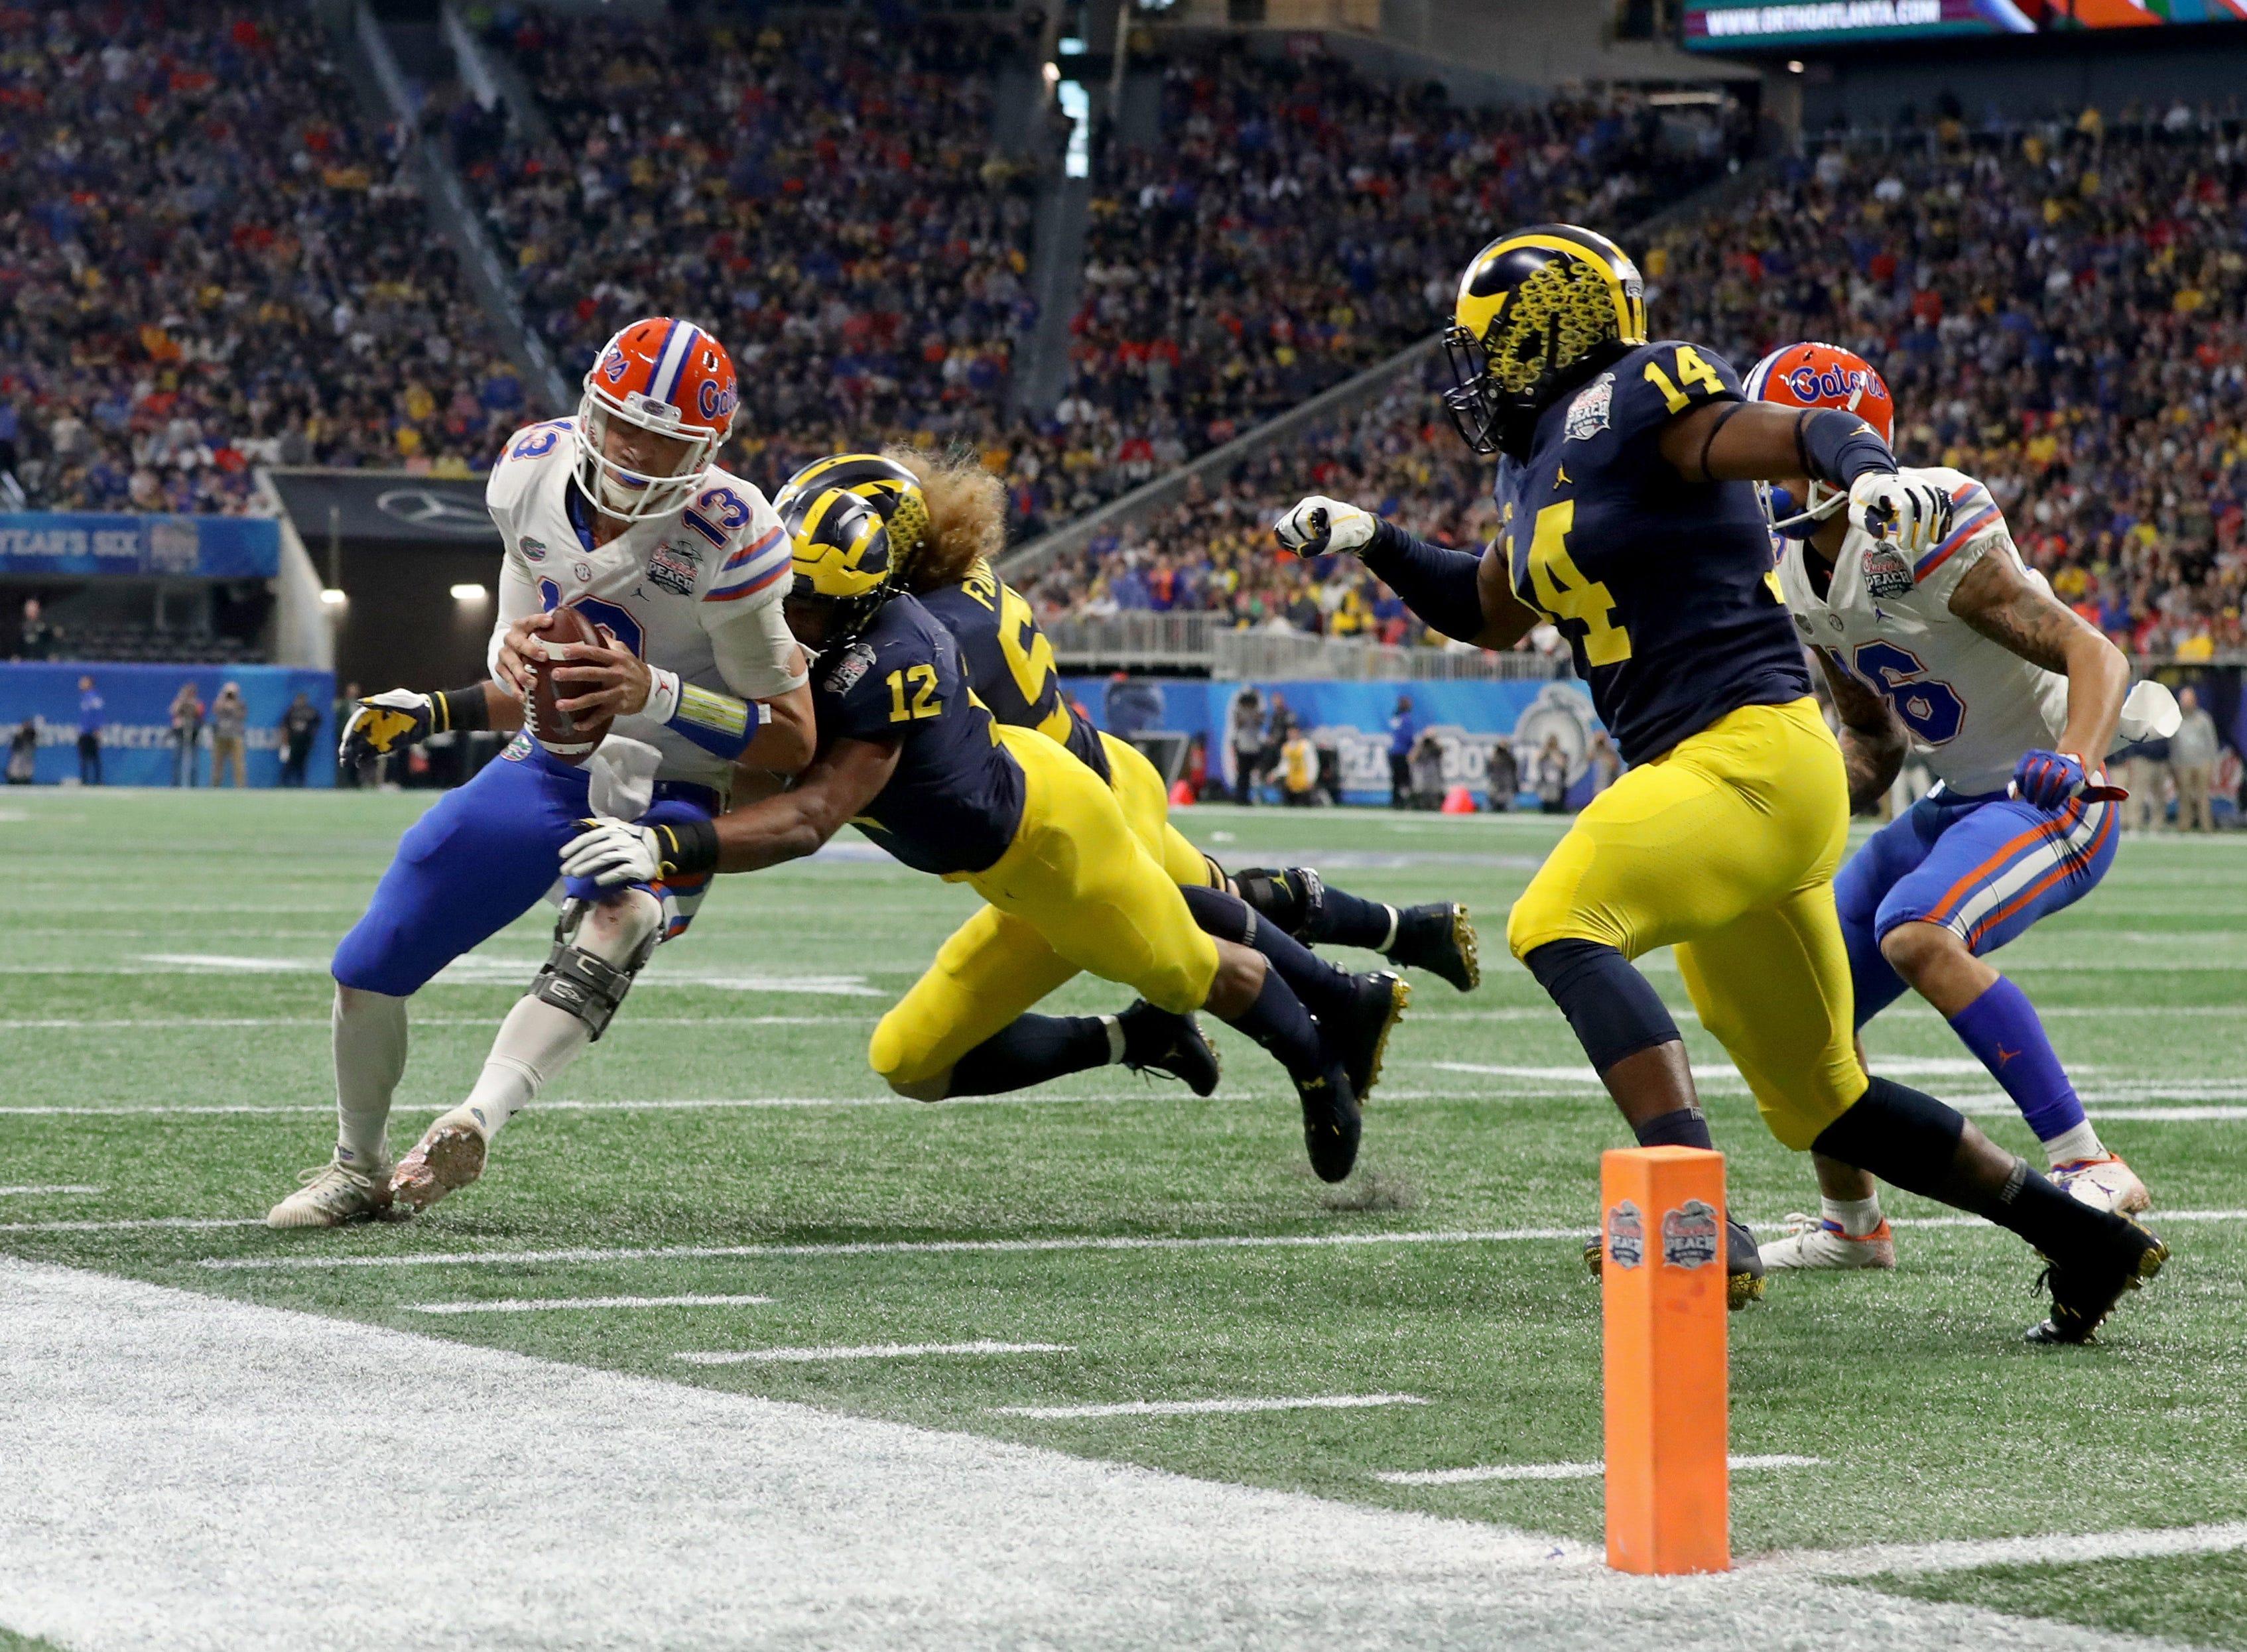 Florida Gators quarterback Feleipe Franks (13) runs against the Michigan Wolverines during the Peach Bowl.